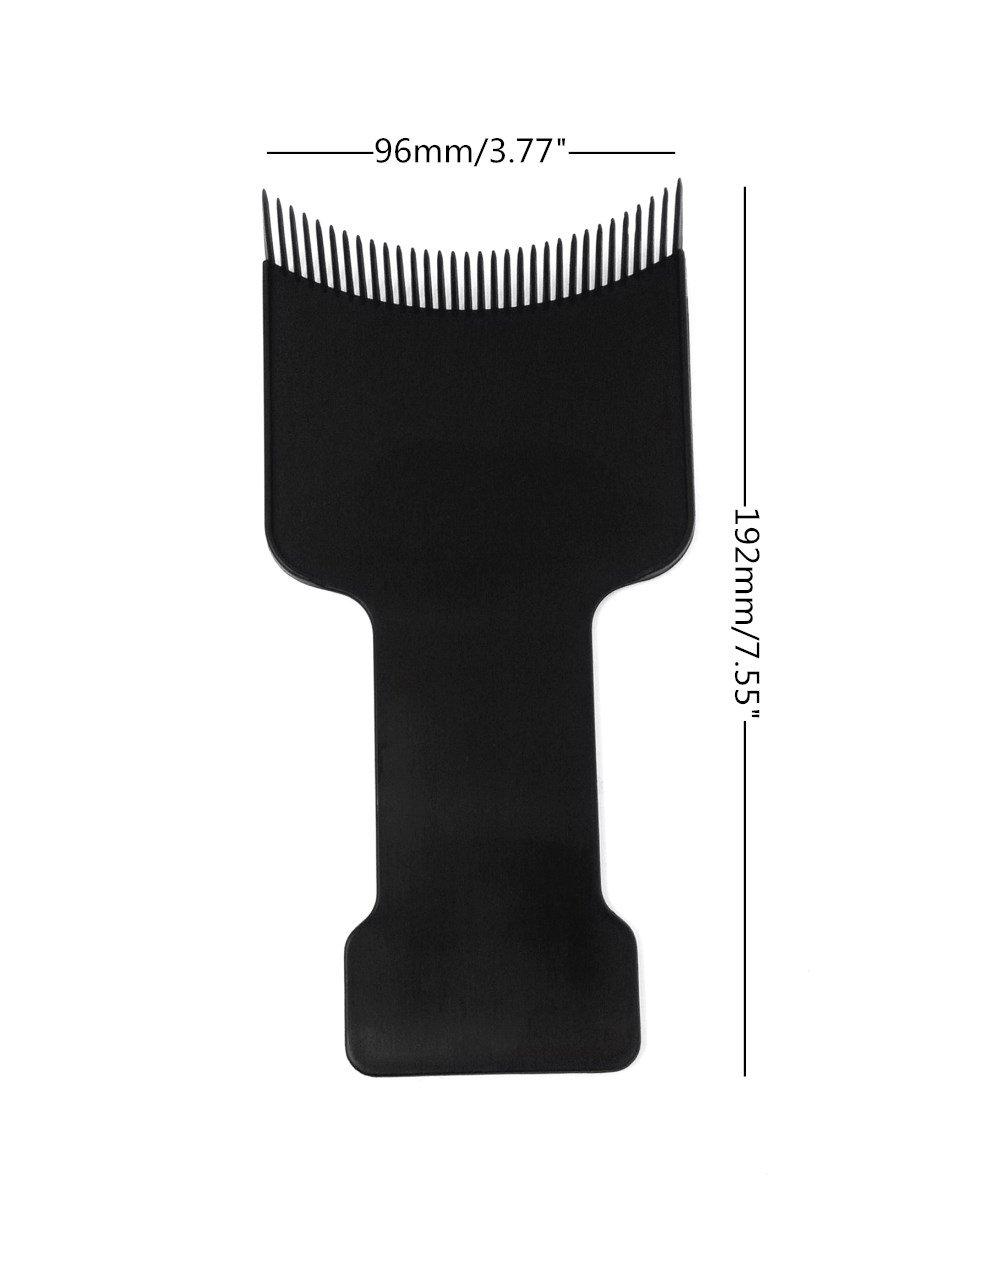 Honbay 2pcs Barber Flat Top Paddle Board Comb Hair Balayage Highlights Board Hair Coloring Kit for Hair Dye : Beauty